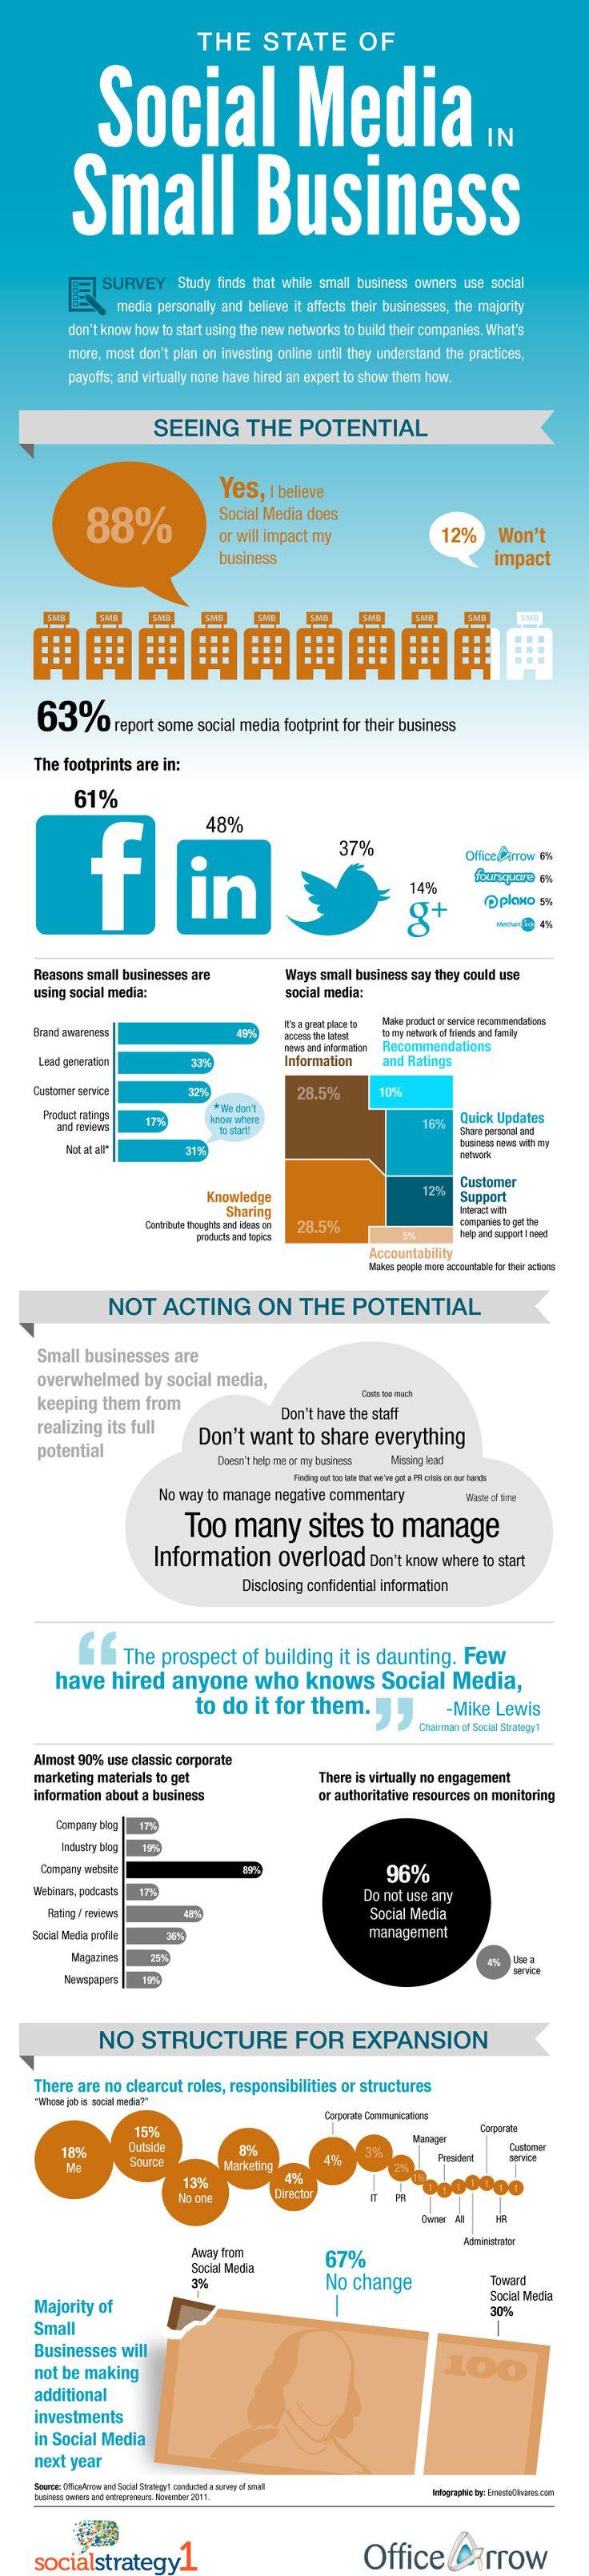 The Rising Need for Social Media Marketing 31 Good Social Media Company Slogans and Taglines